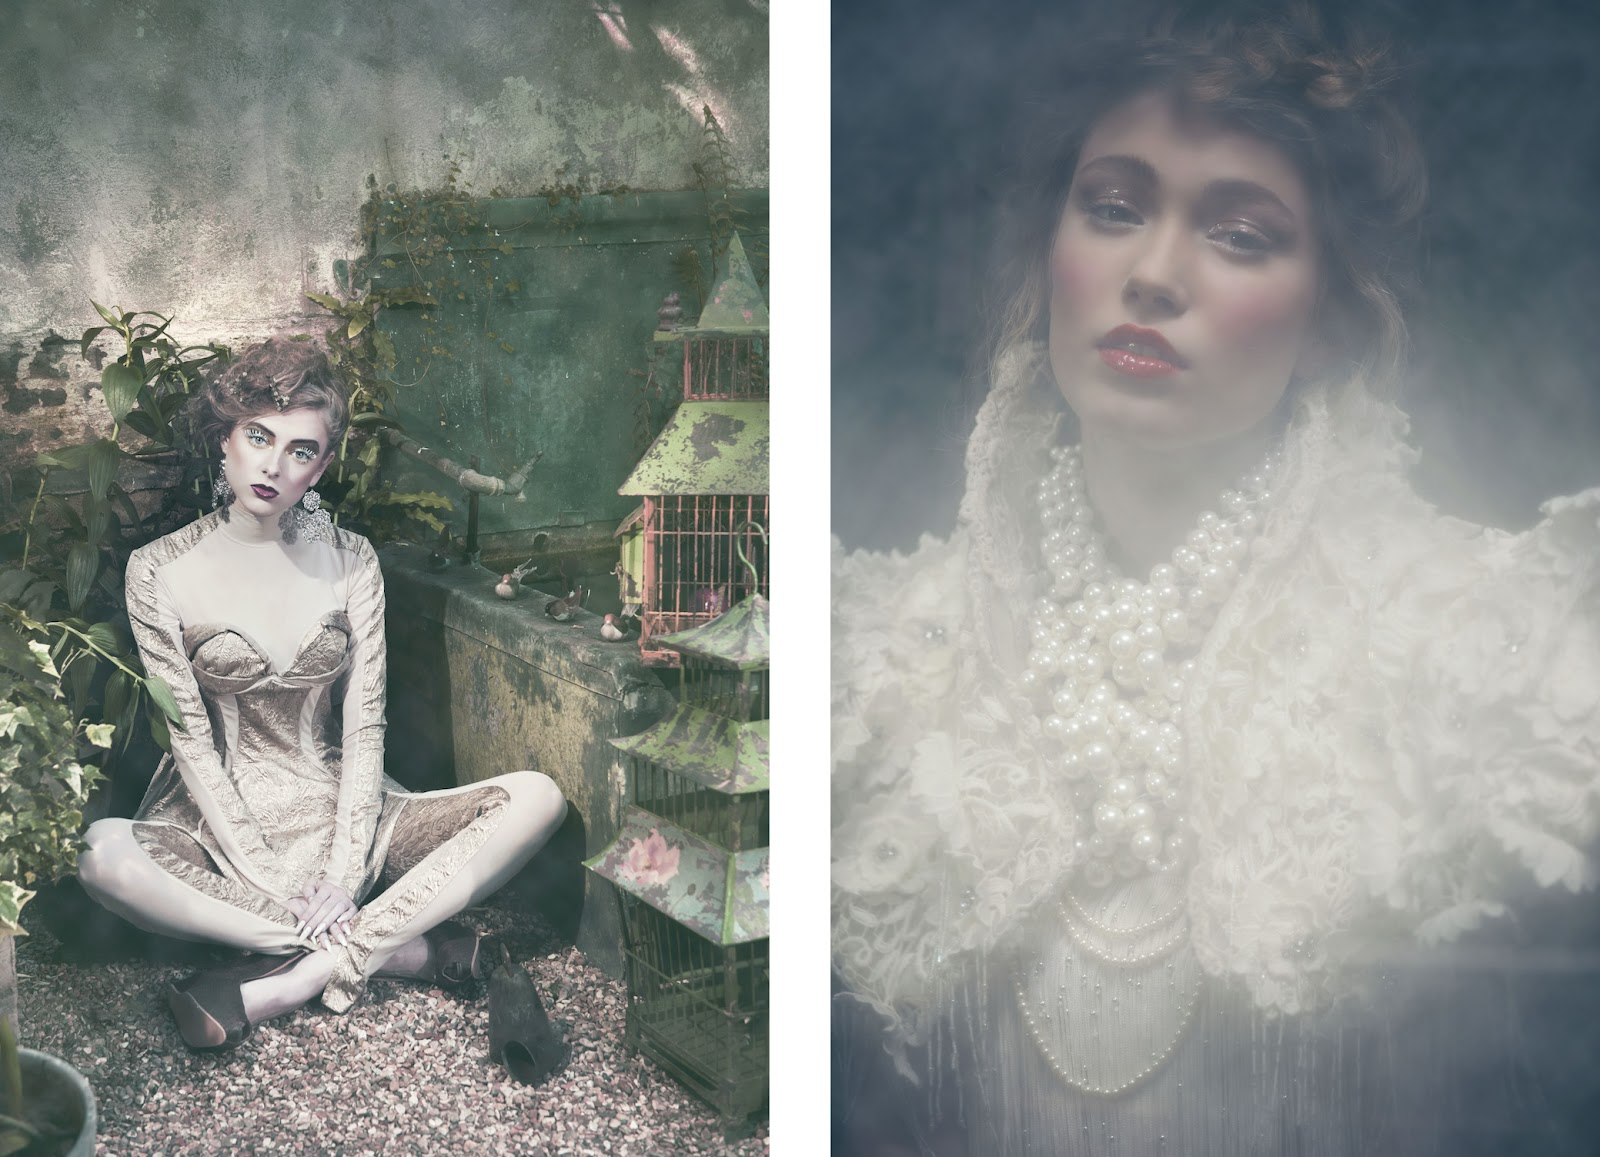 http://3.bp.blogspot.com/-ubBK4RMmHmg/UD8UPQdPZFI/AAAAAAAAUa0/tcujsITRp-I/s1600/Alice-Luker_fashionproduction_015.jpg